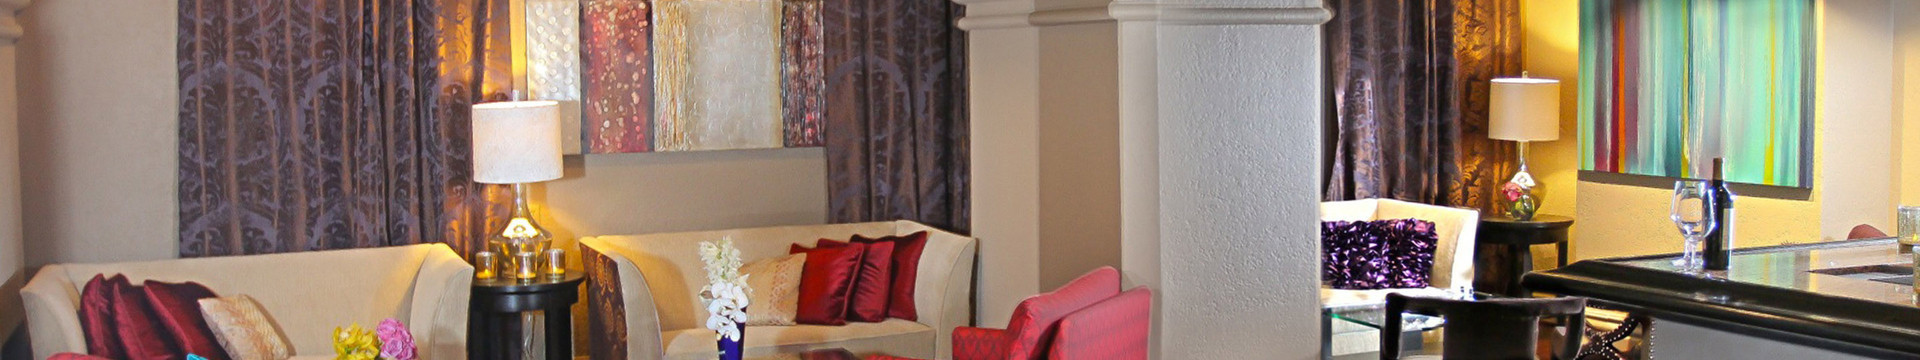 Hotel Block For Your Wedding In Las Vegas | Hotel Room In Las Vegas